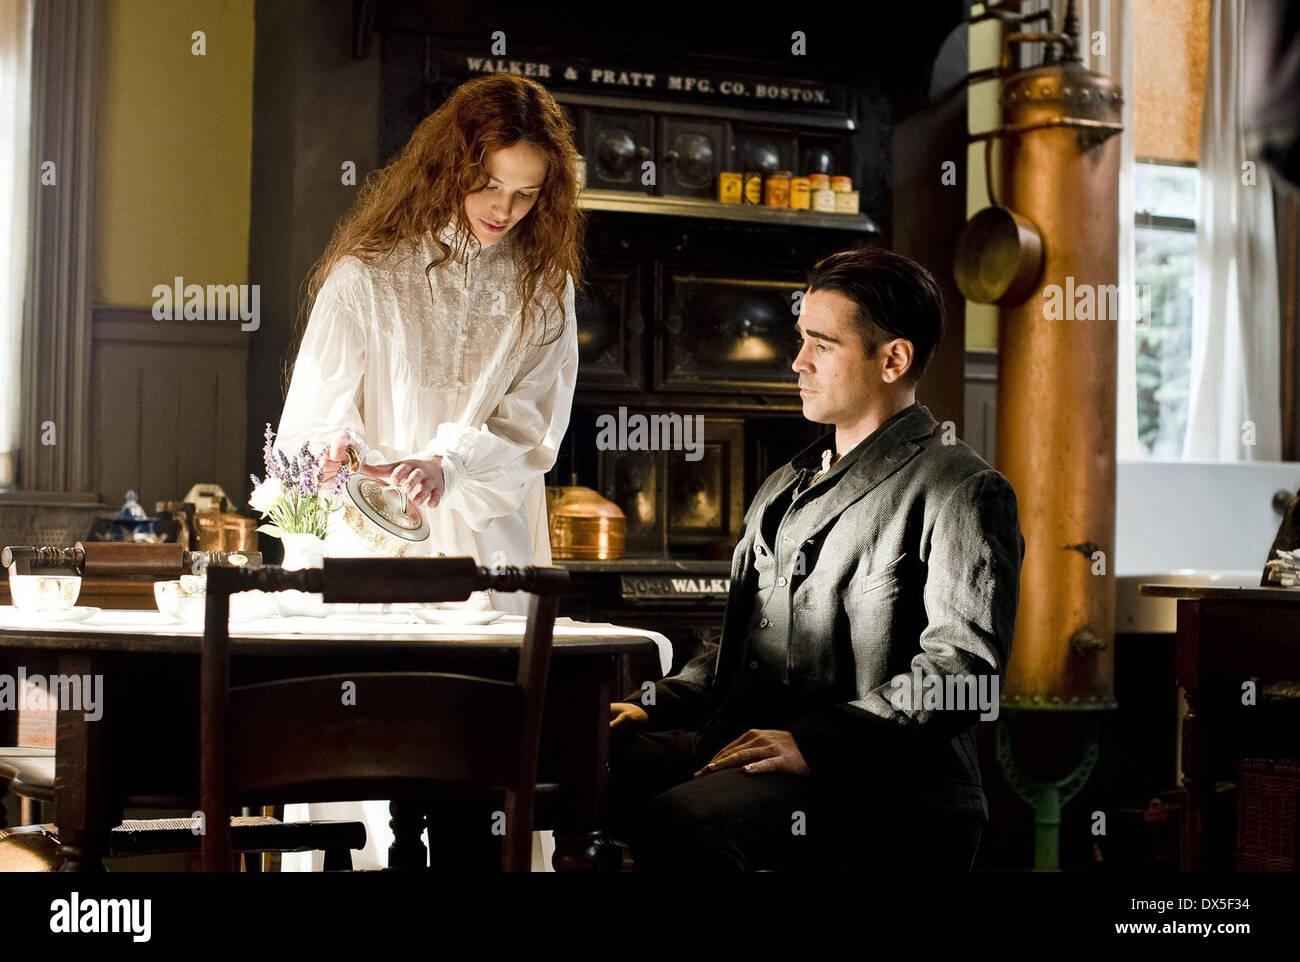 A WINTER'S TALE (2014) JESSICA BROWN FINDLAY COLIN FARRELL AKIVA GOLDSMAN (DIR) MOVIESTORE COLLECTION LTD - Stock Image